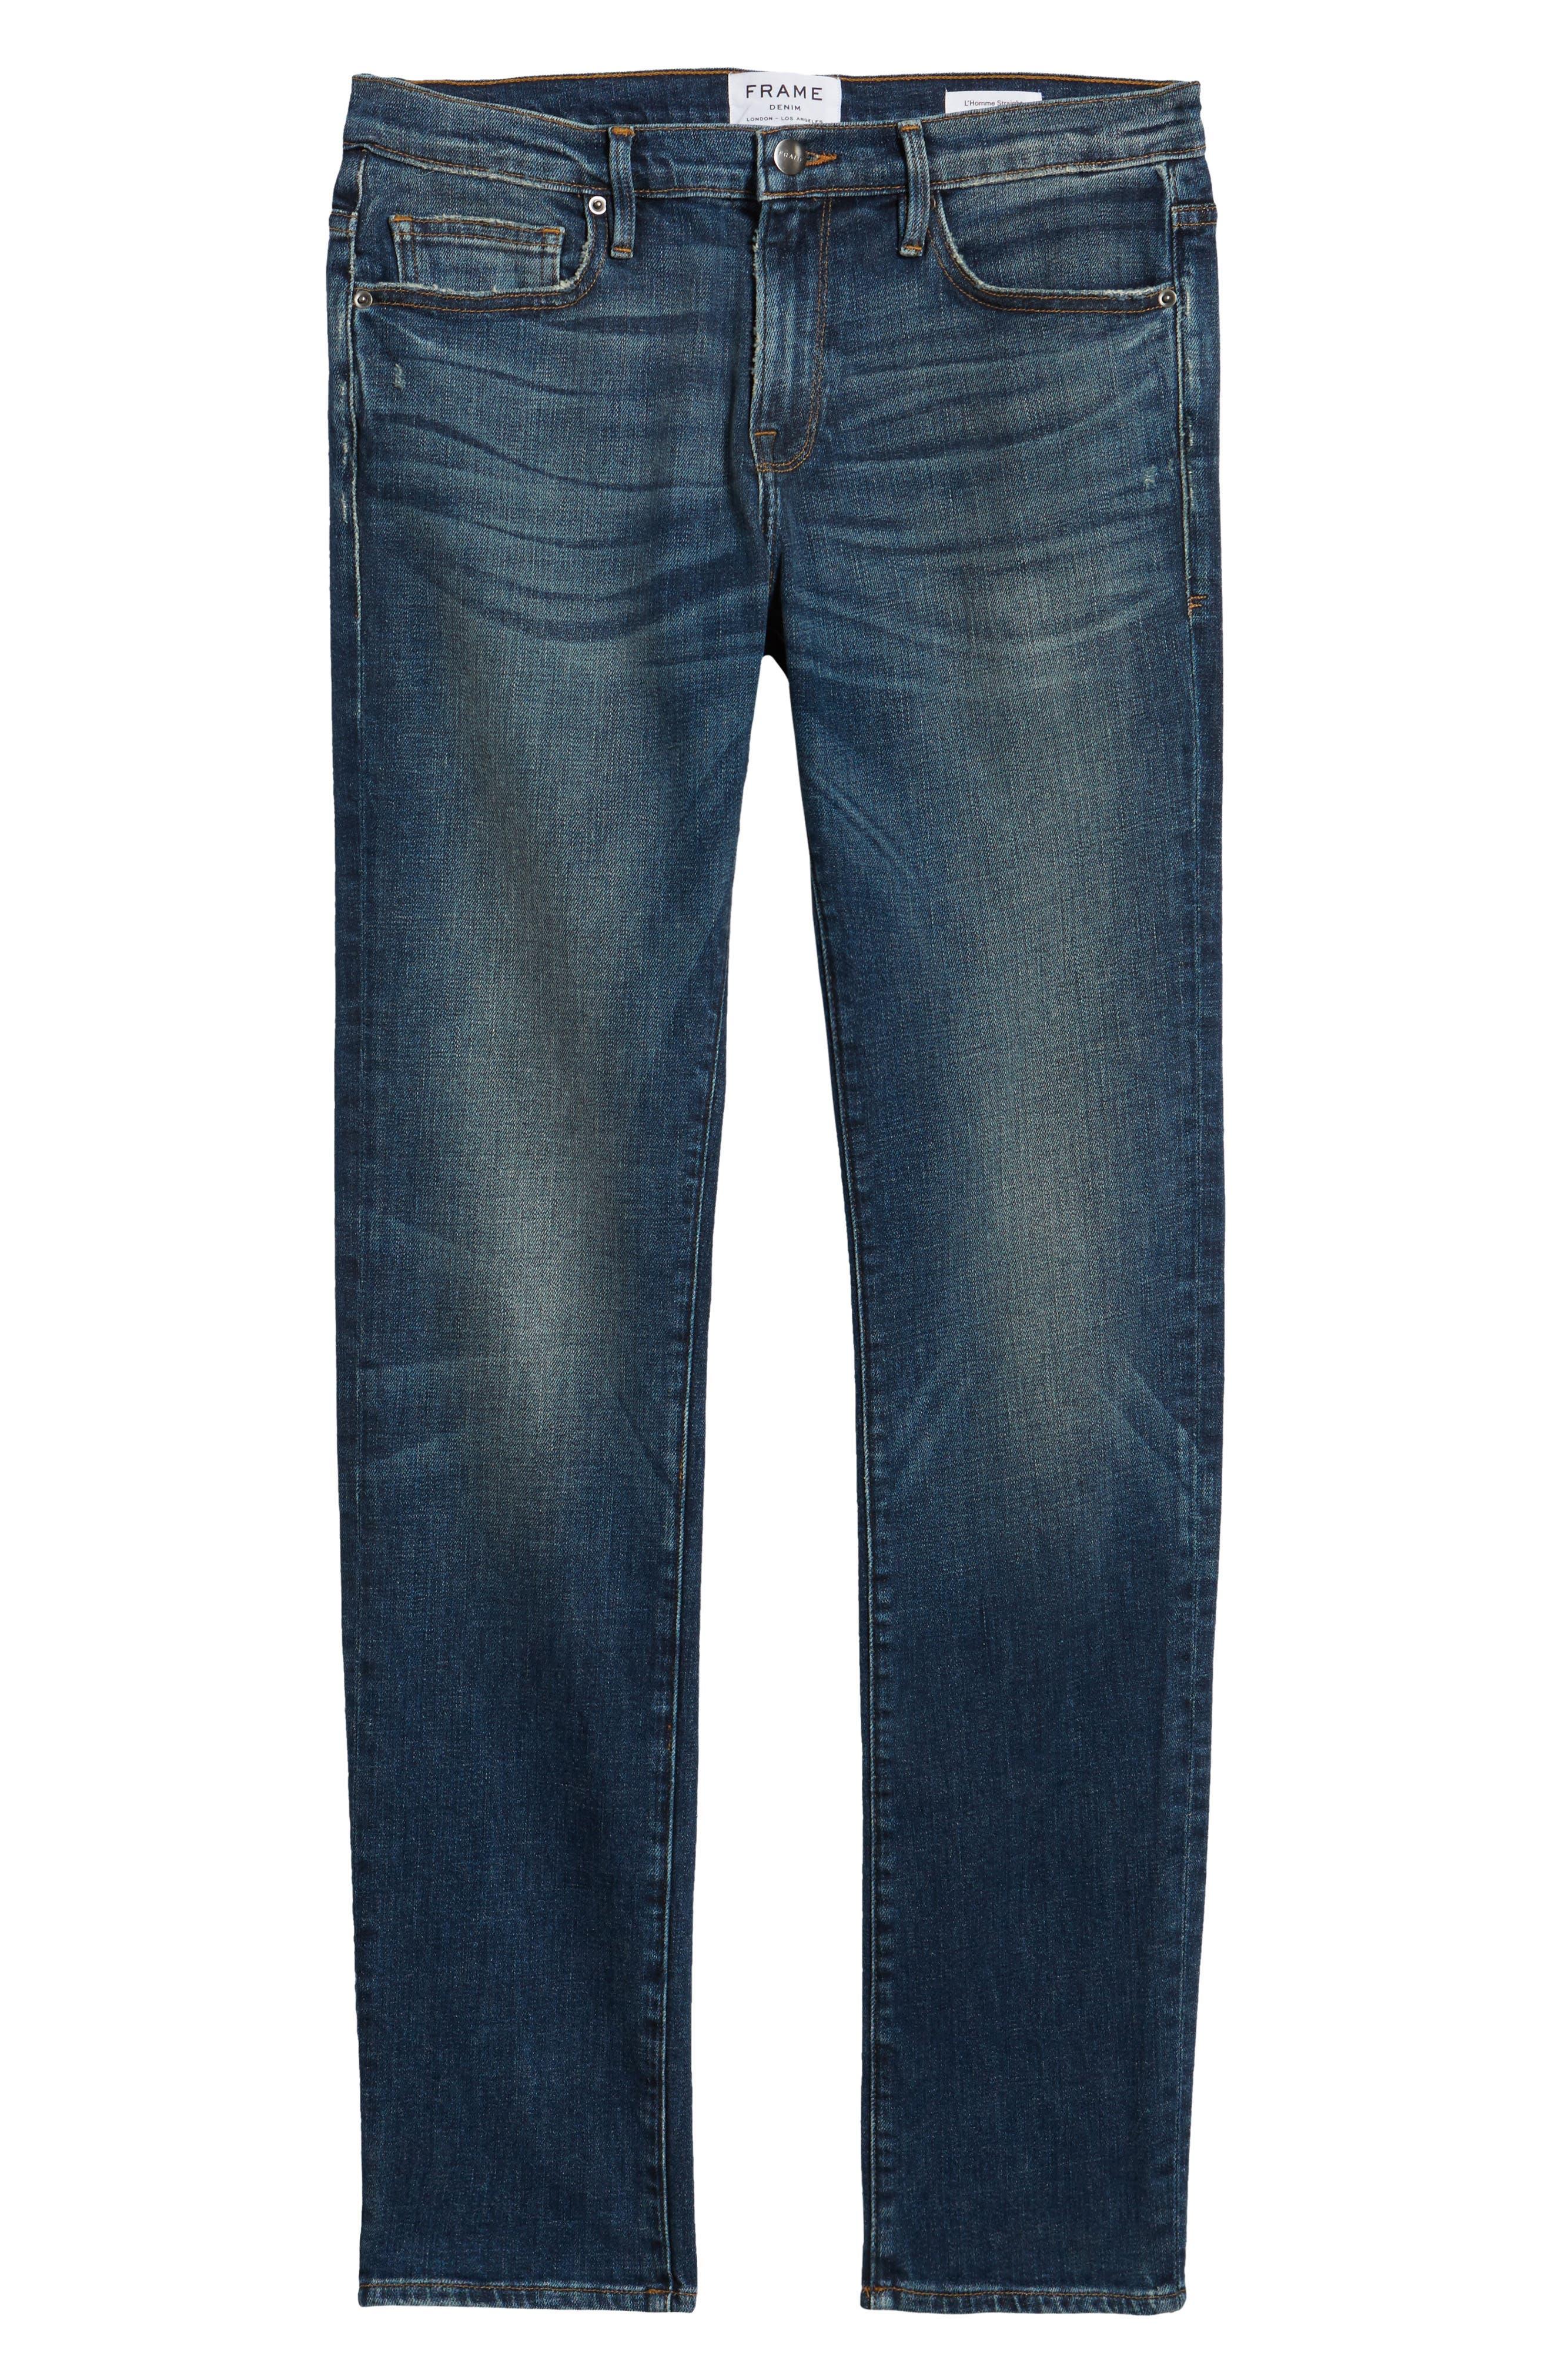 L'Homme Slim Fit Jeans,                             Alternate thumbnail 6, color,                             Salt Lake